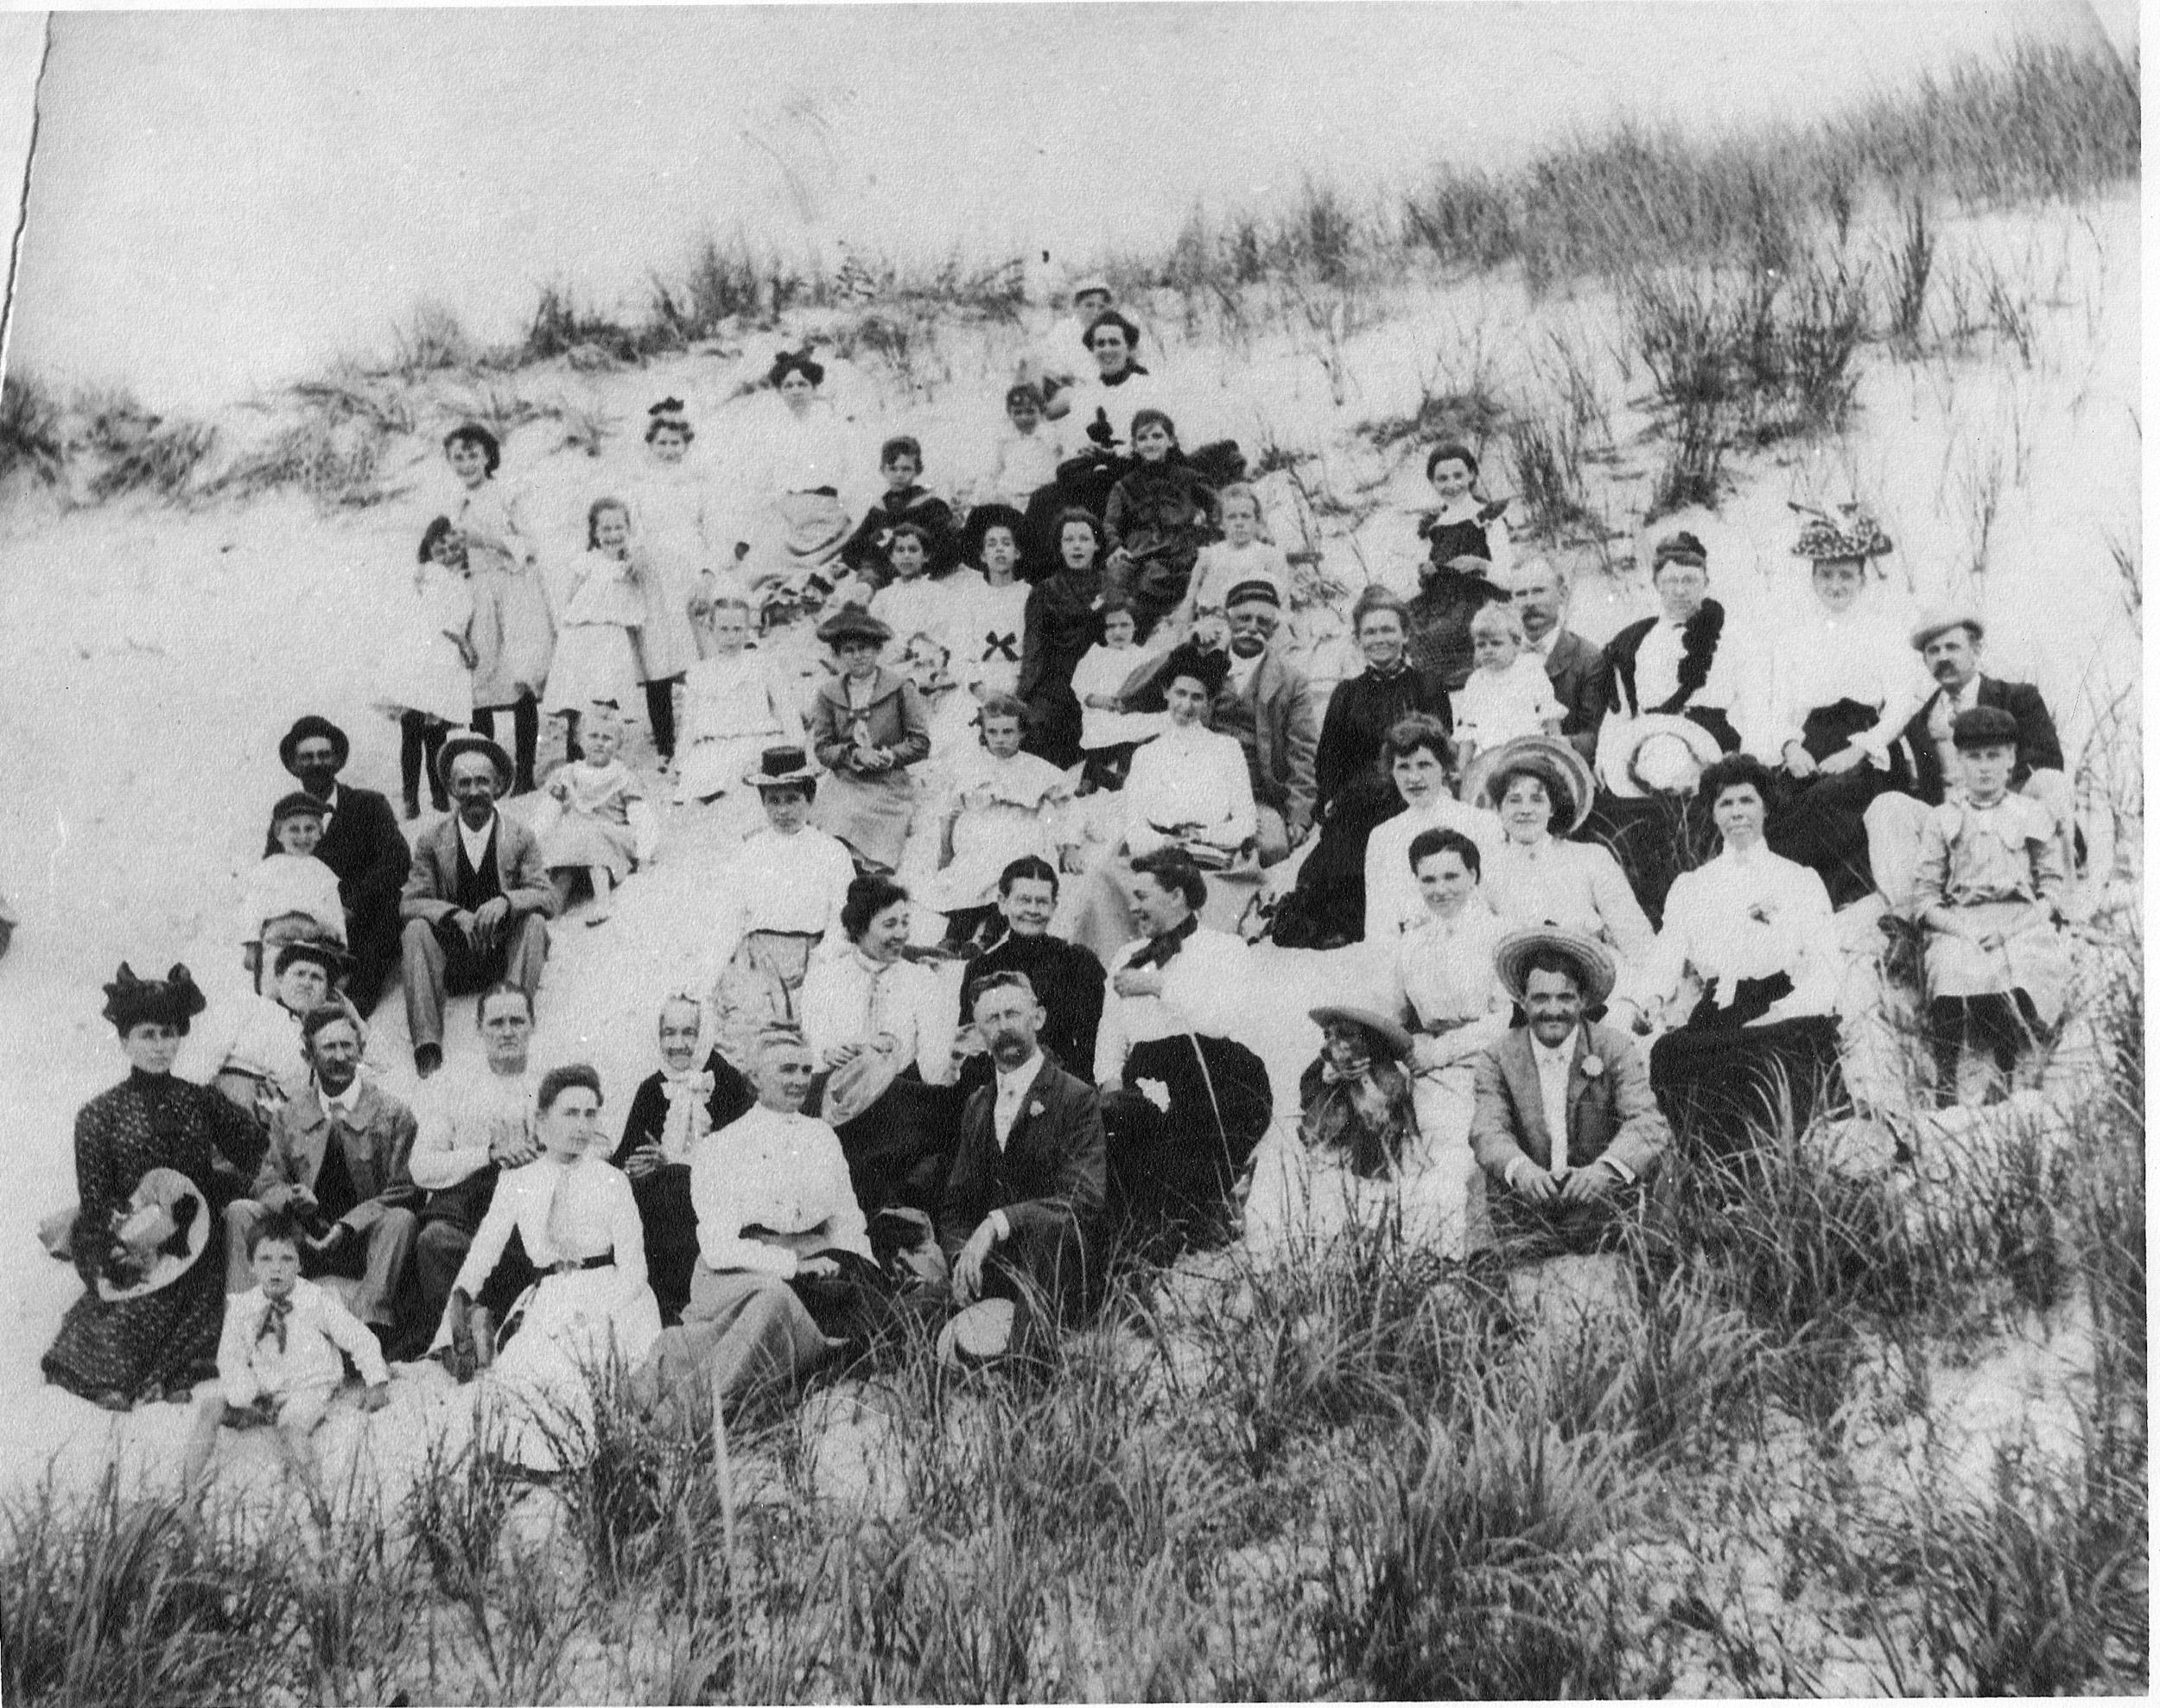 MethodistChurchPicnic circa1904.jpg